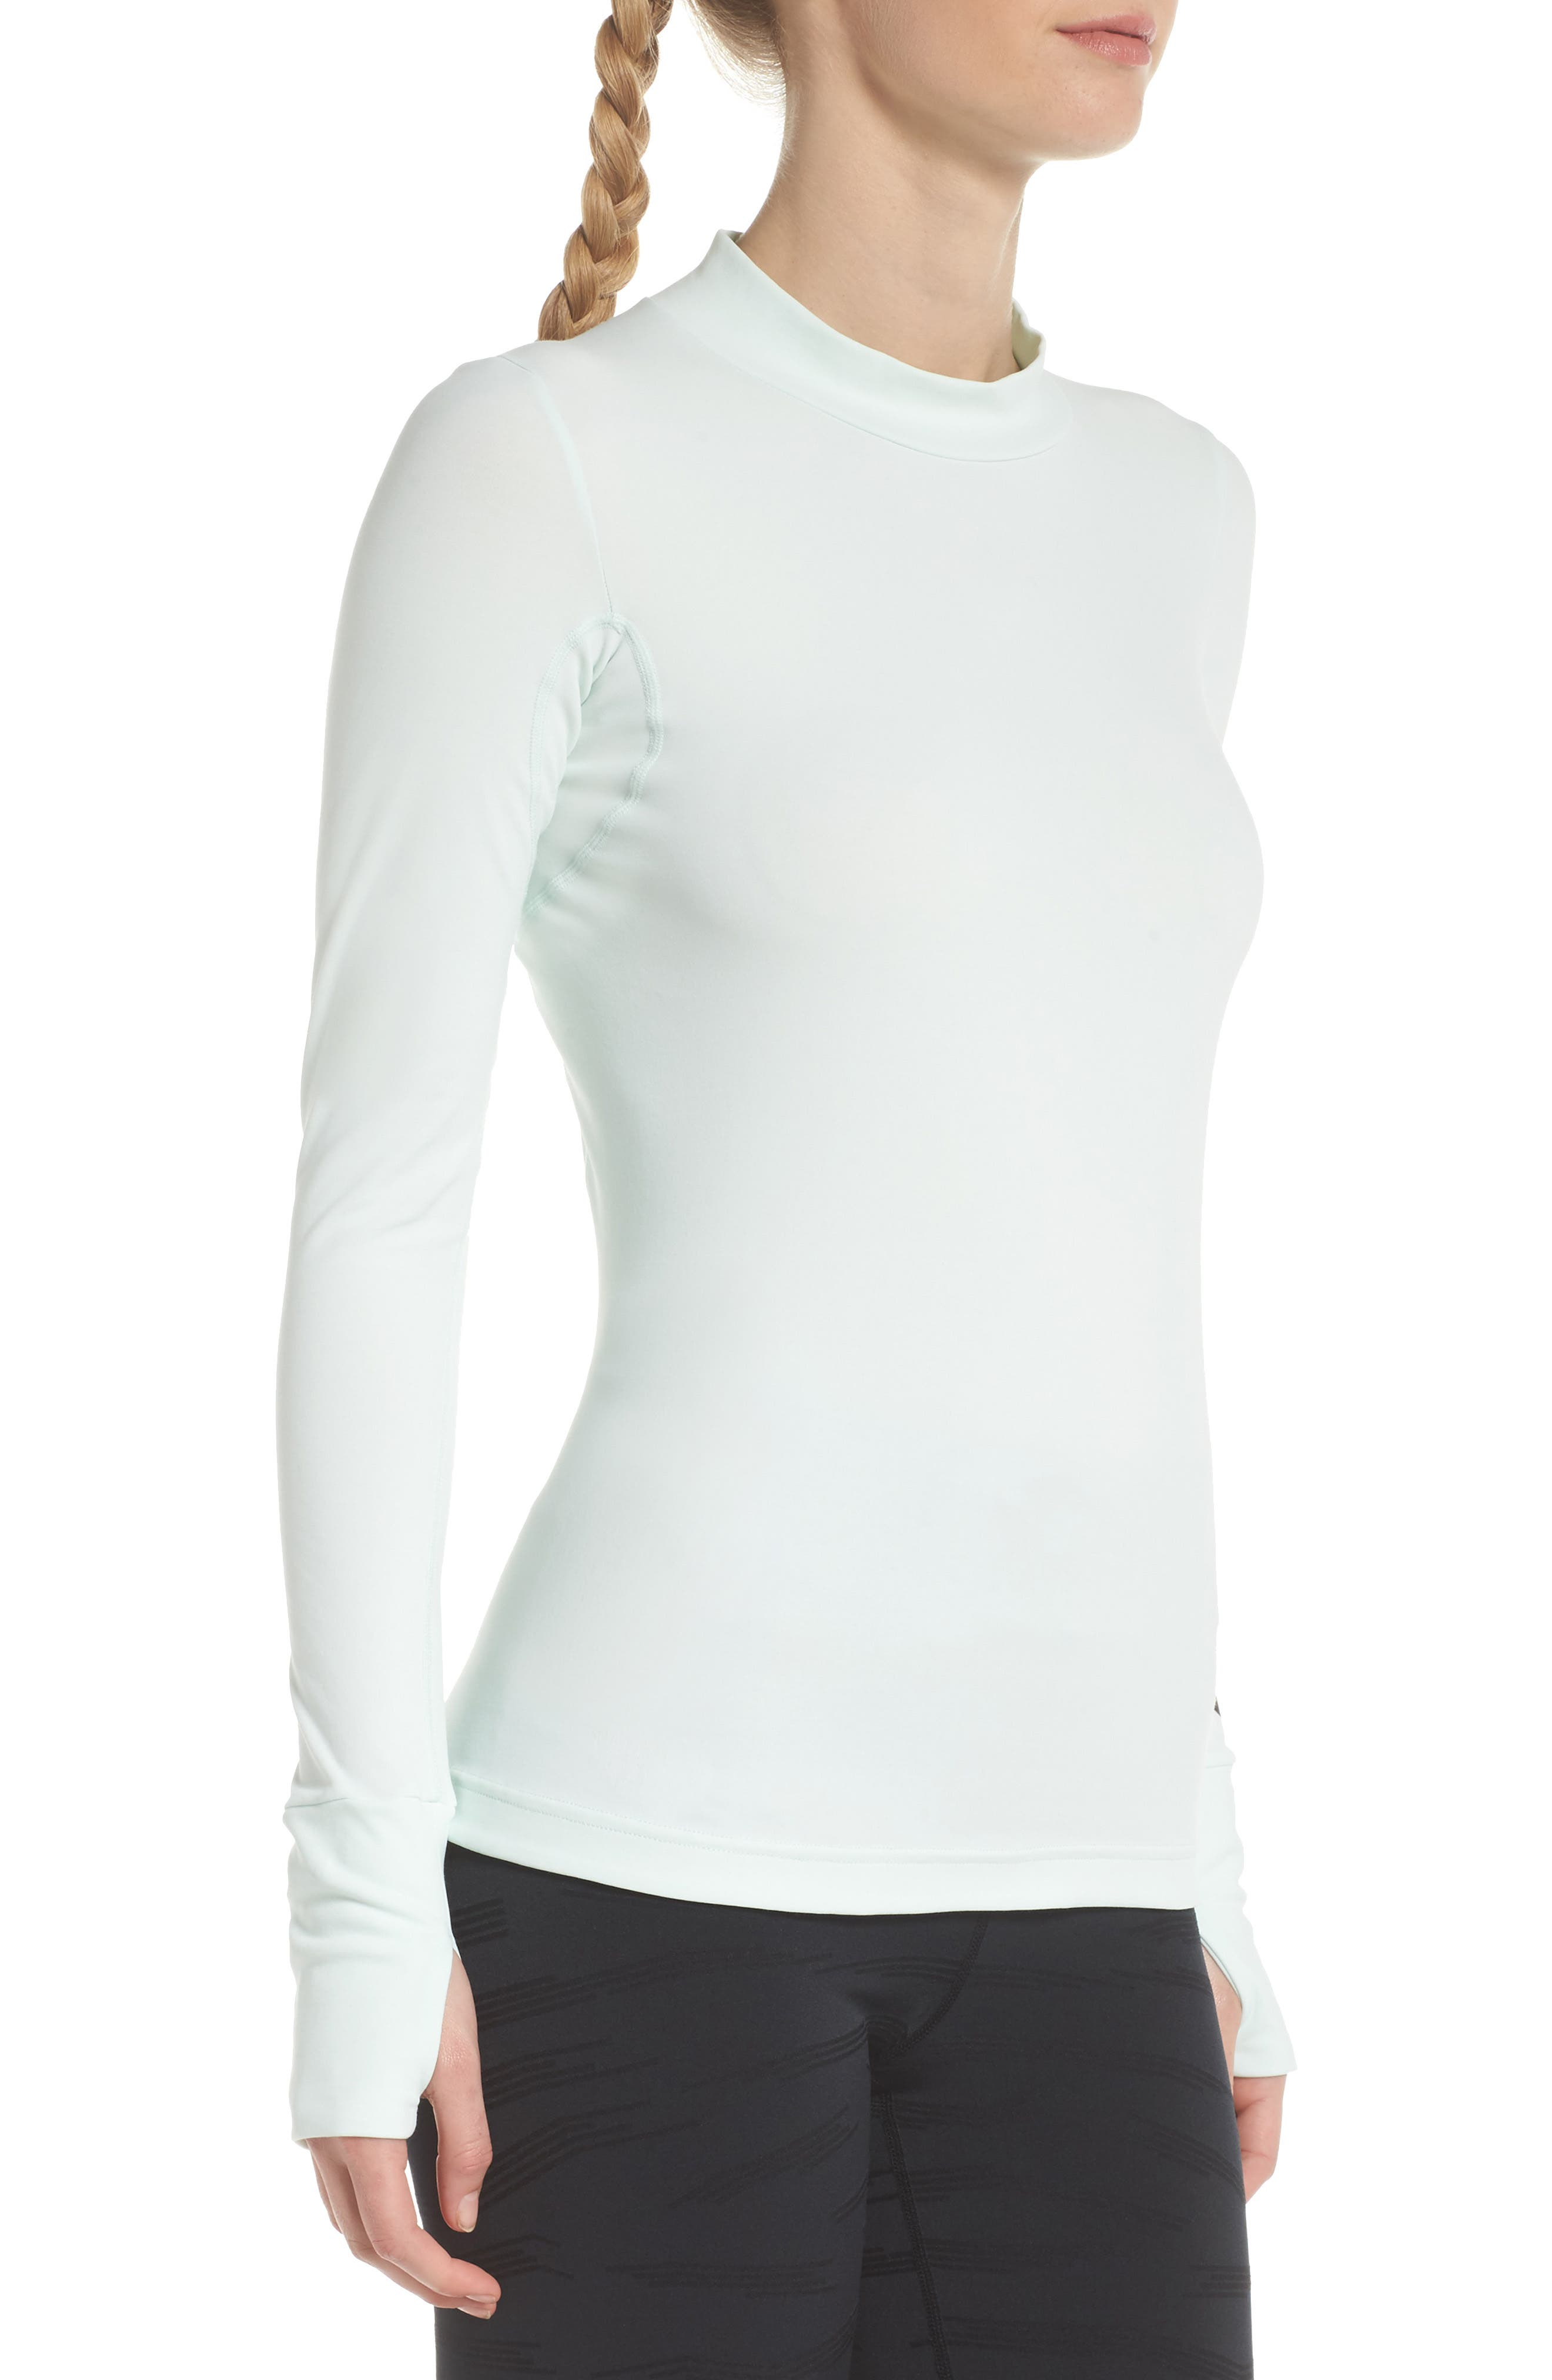 NikeLab ACG Long Sleeve Women's Top,                             Alternate thumbnail 3, color,                             Barely Green/ Black